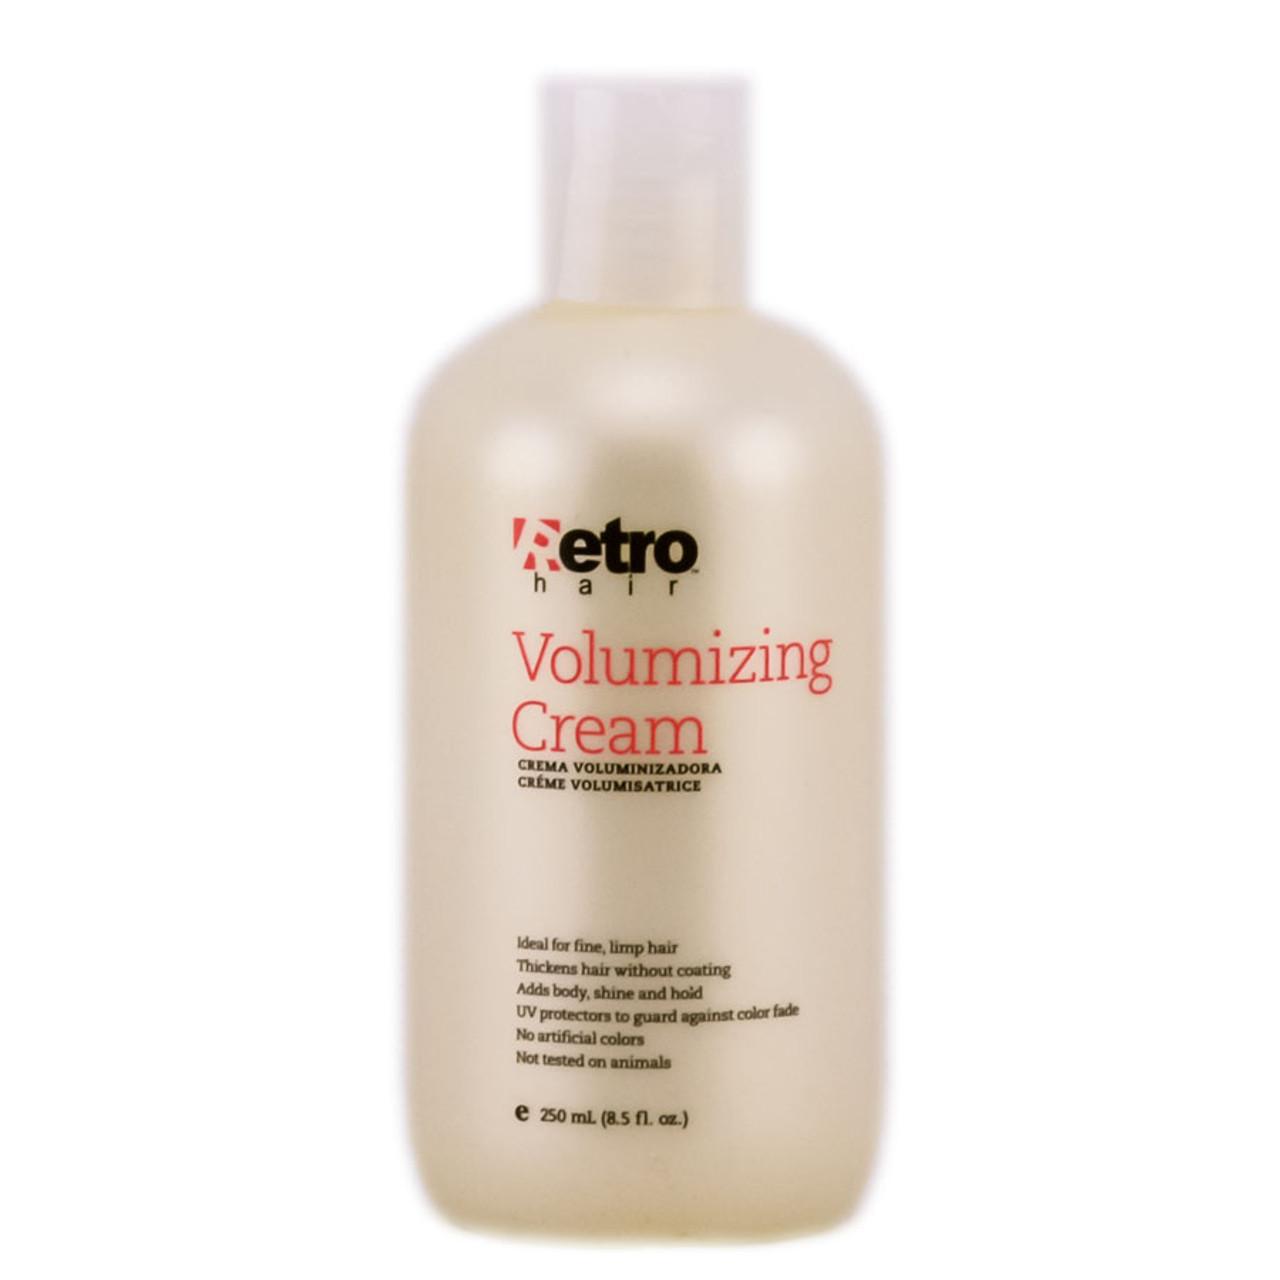 Retro Hair Volumizing Cream Sleekshop Formerly Sleekhair 8 Oz